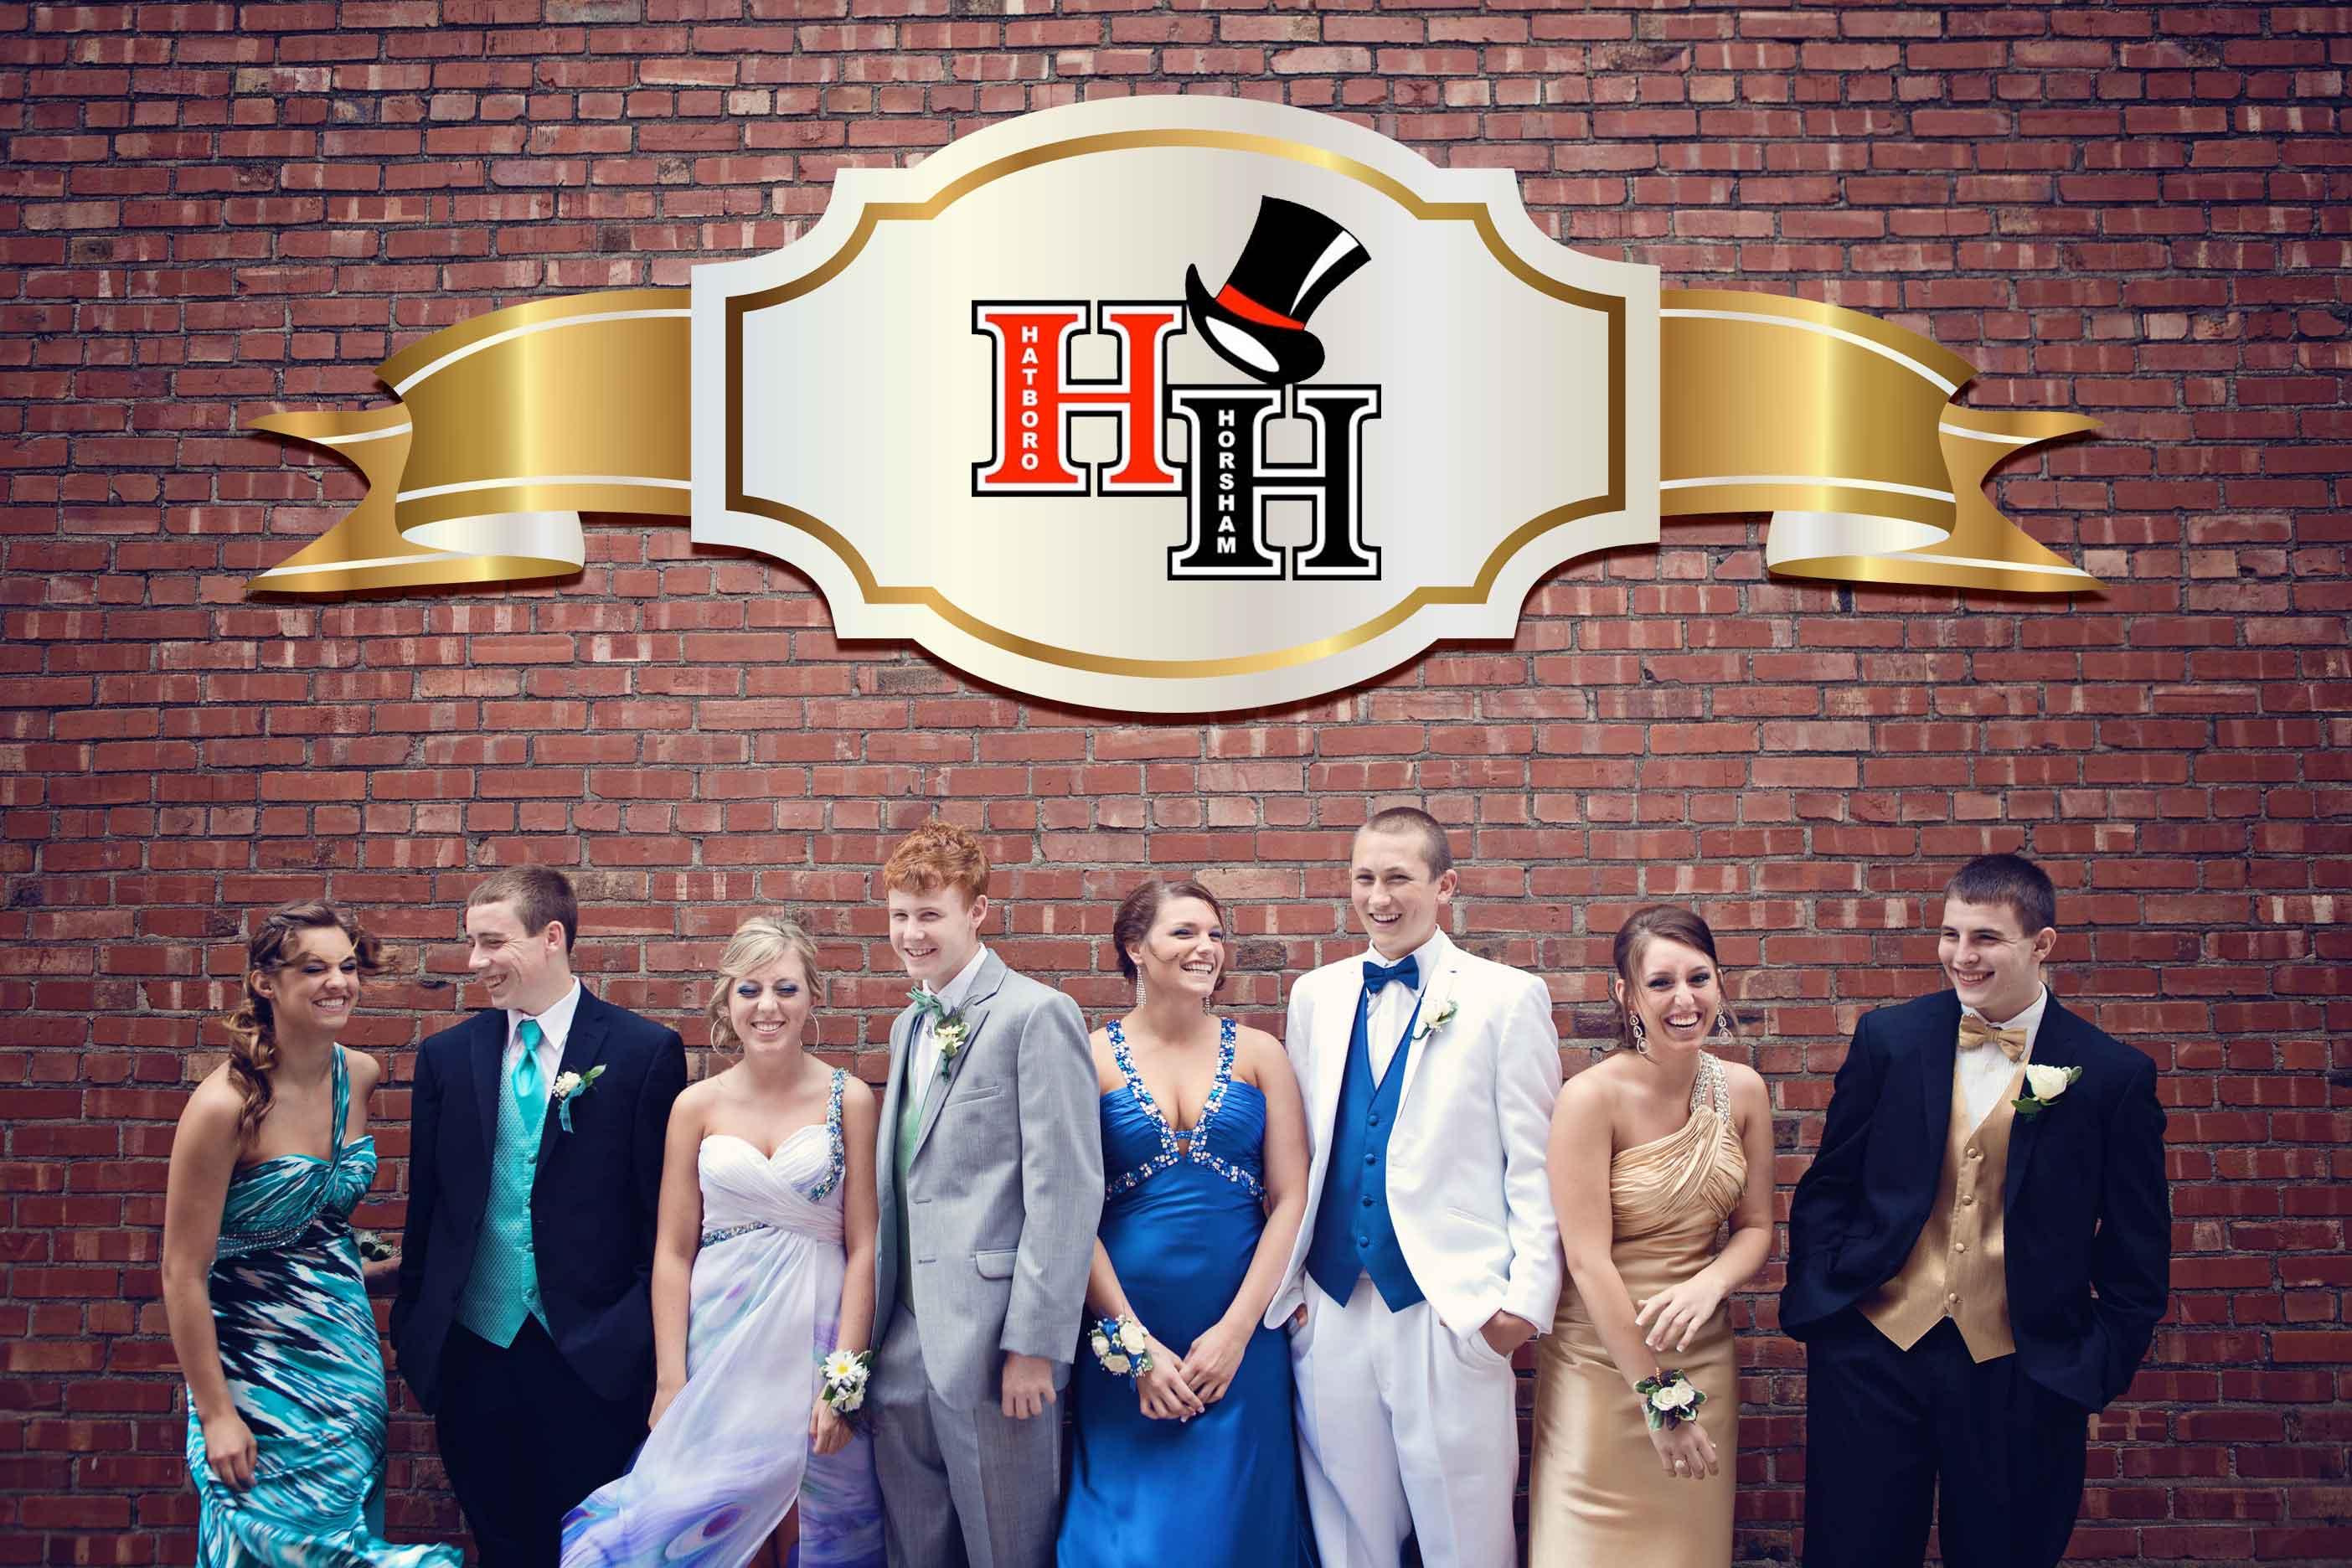 hatboro-horsham high school prom